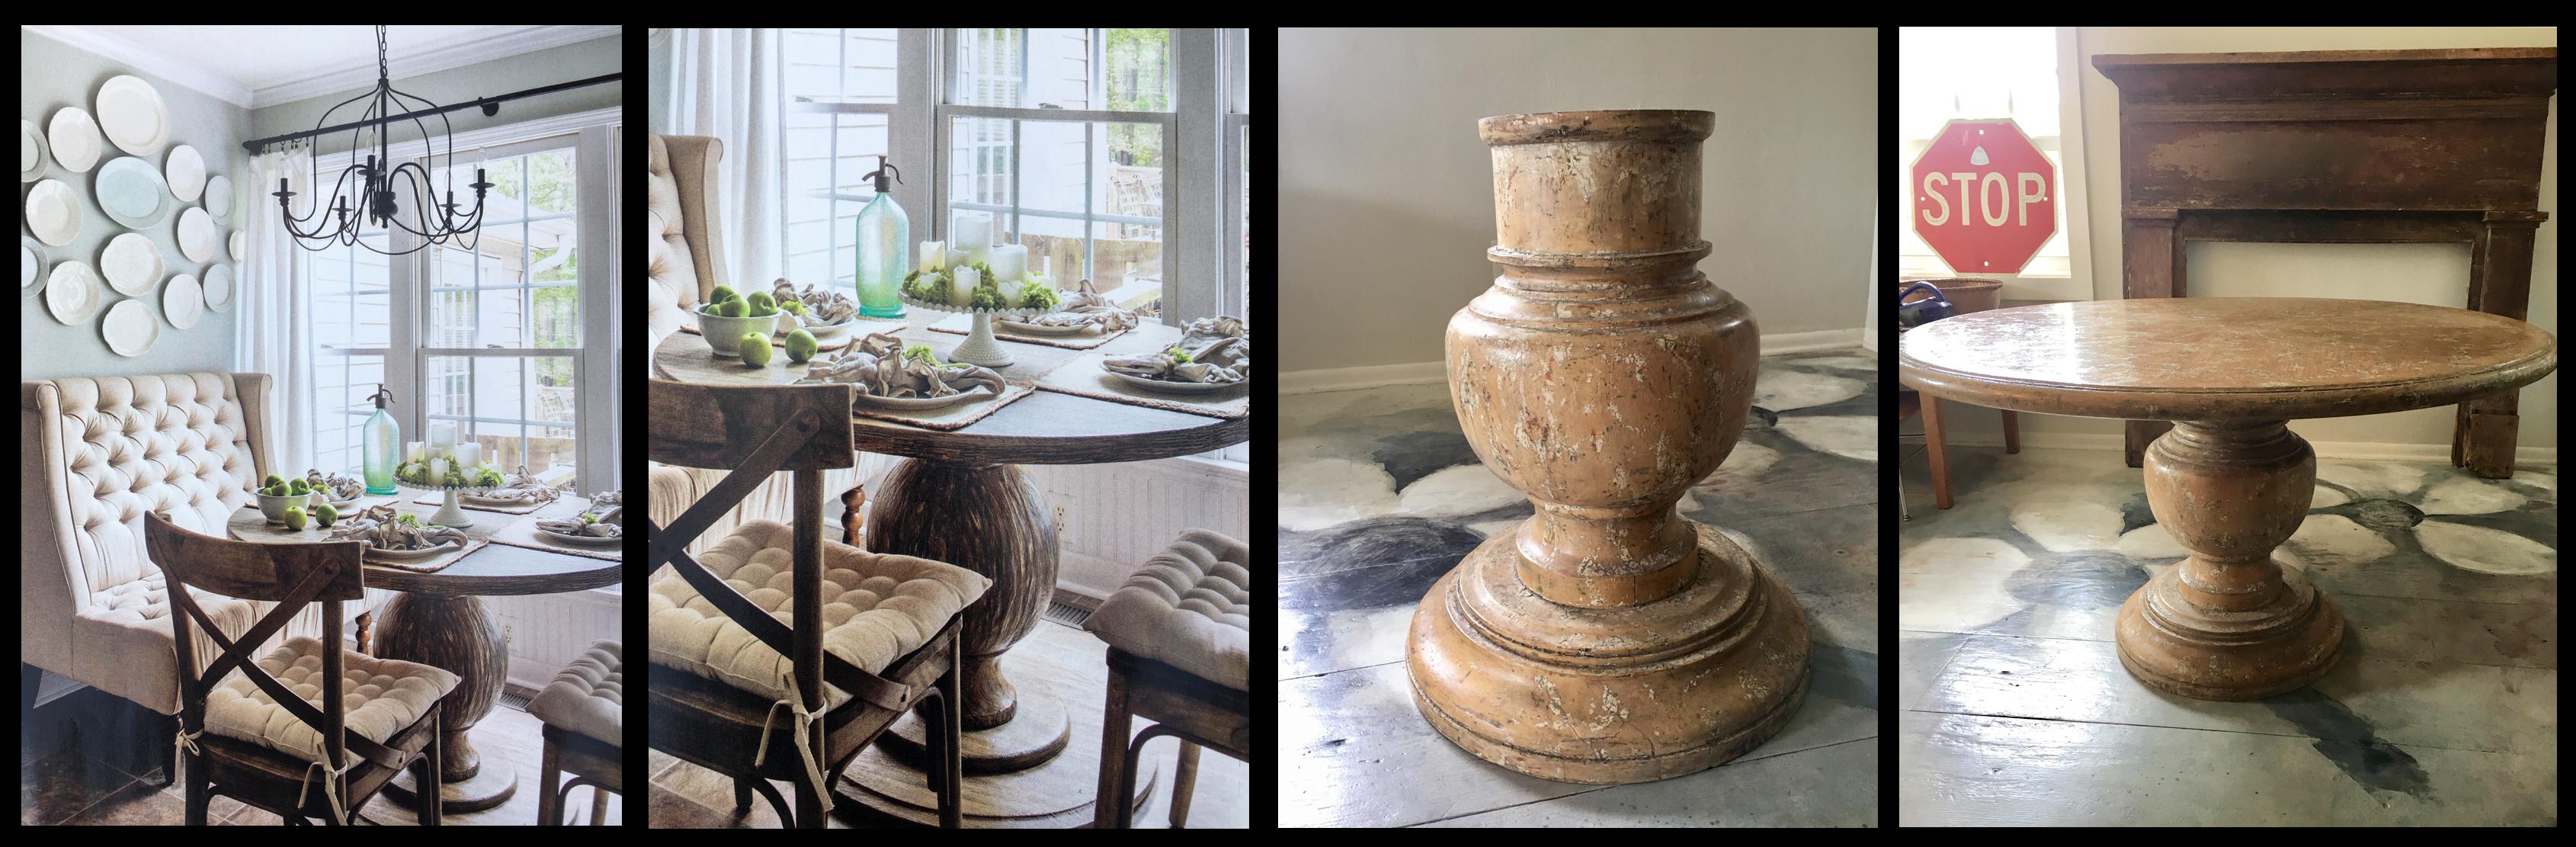 Round Farmhouse Balustrade Table